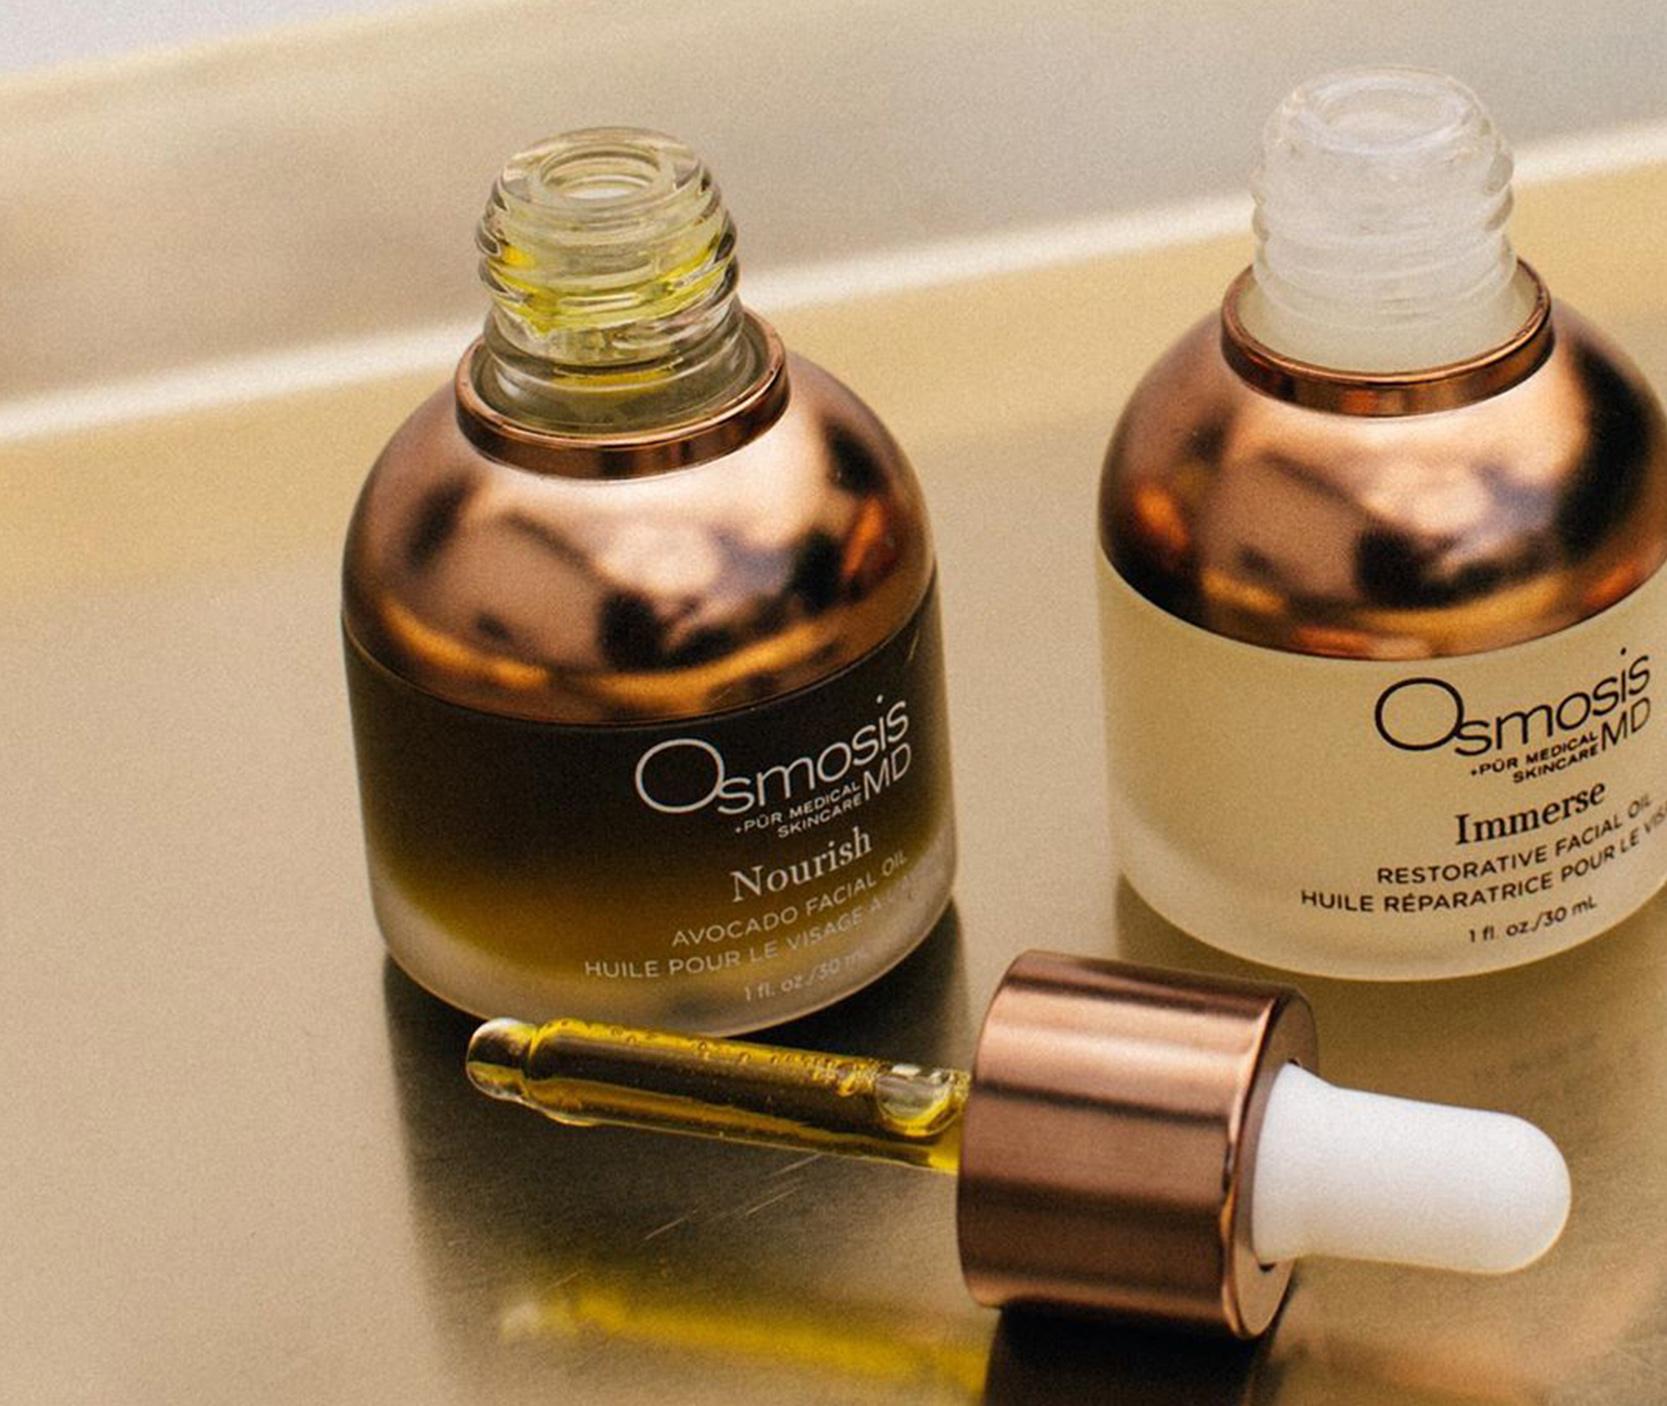 Osmosis Skincare: Nourish Avocado Facial Oil